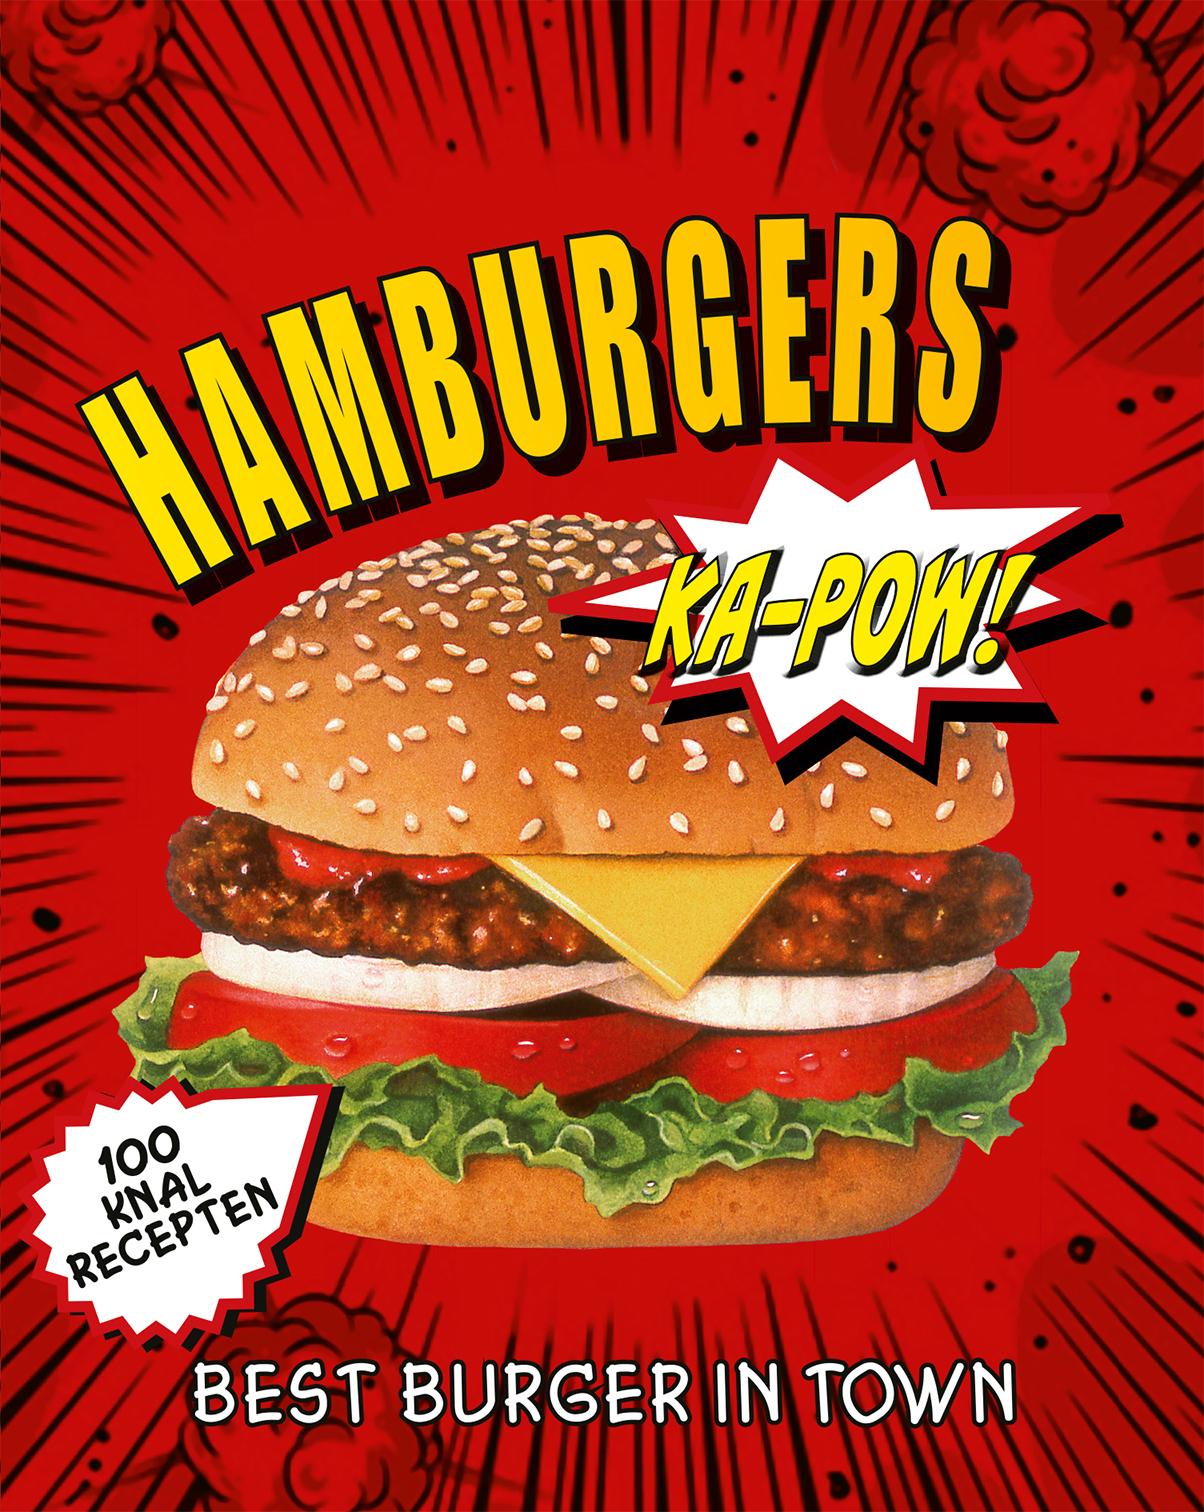 Hamburgers - Best burger in town